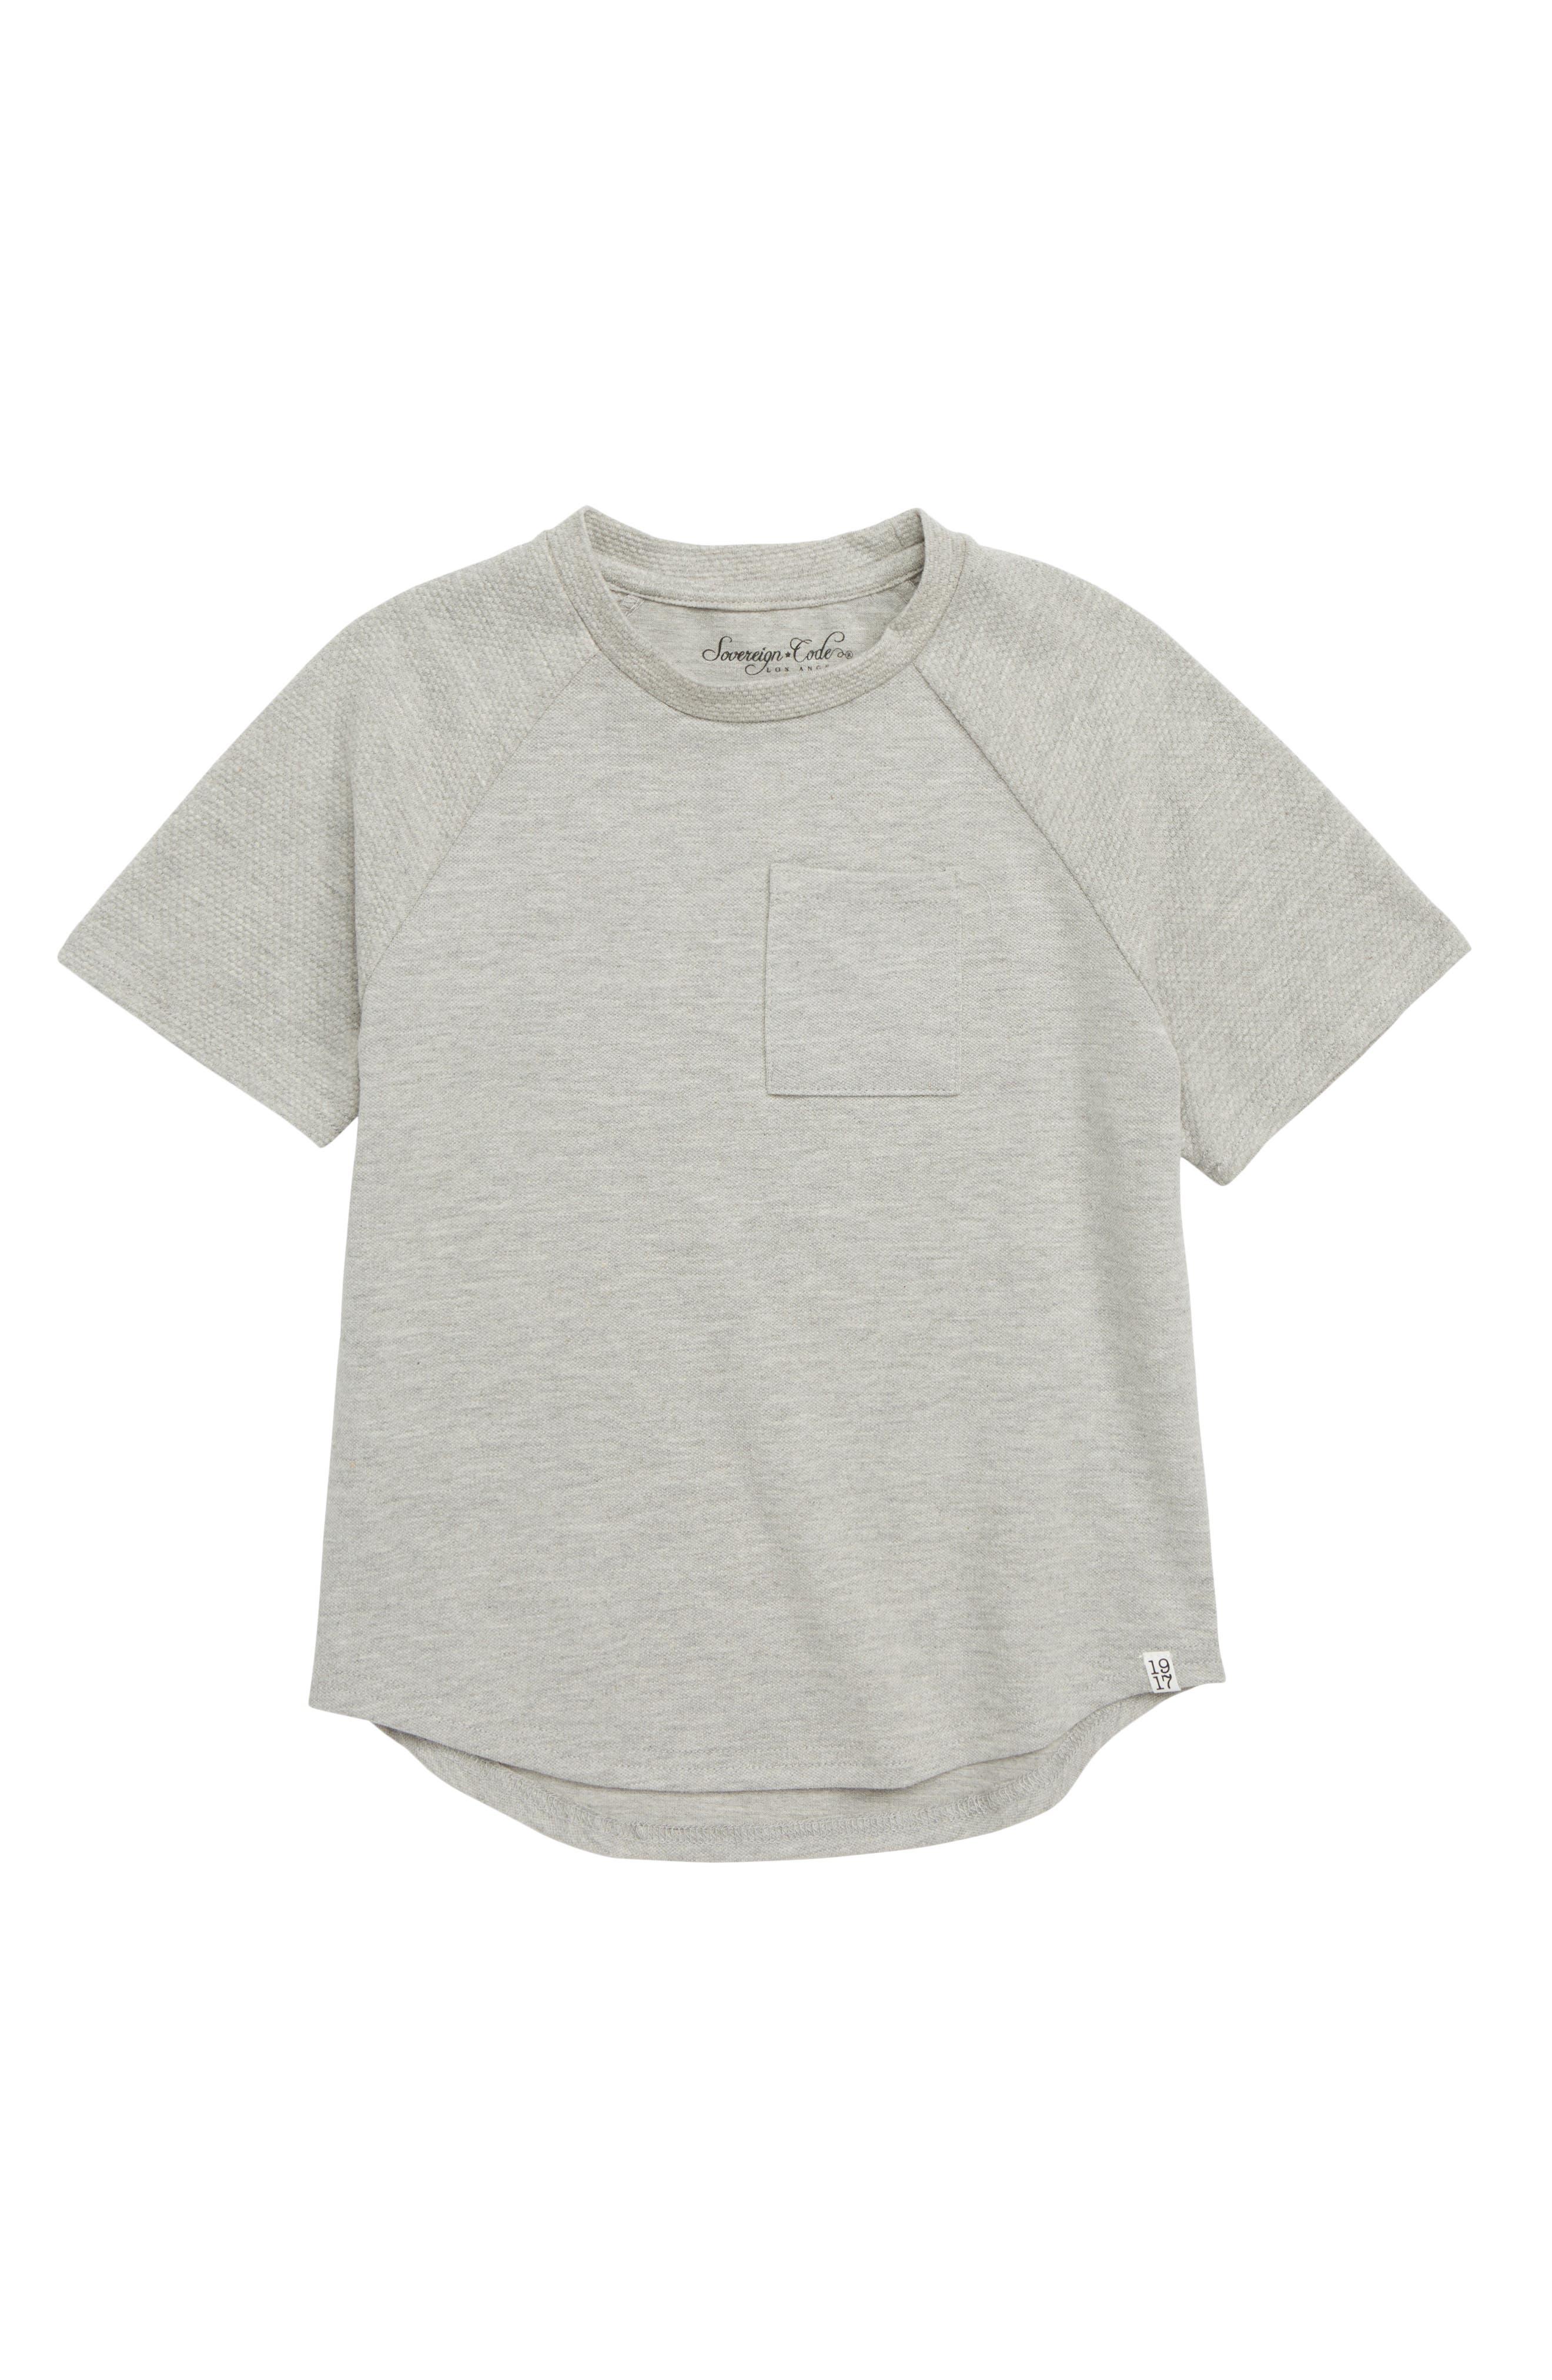 Suburb T-Shirt,                         Main,                         color, HEATHER GREY